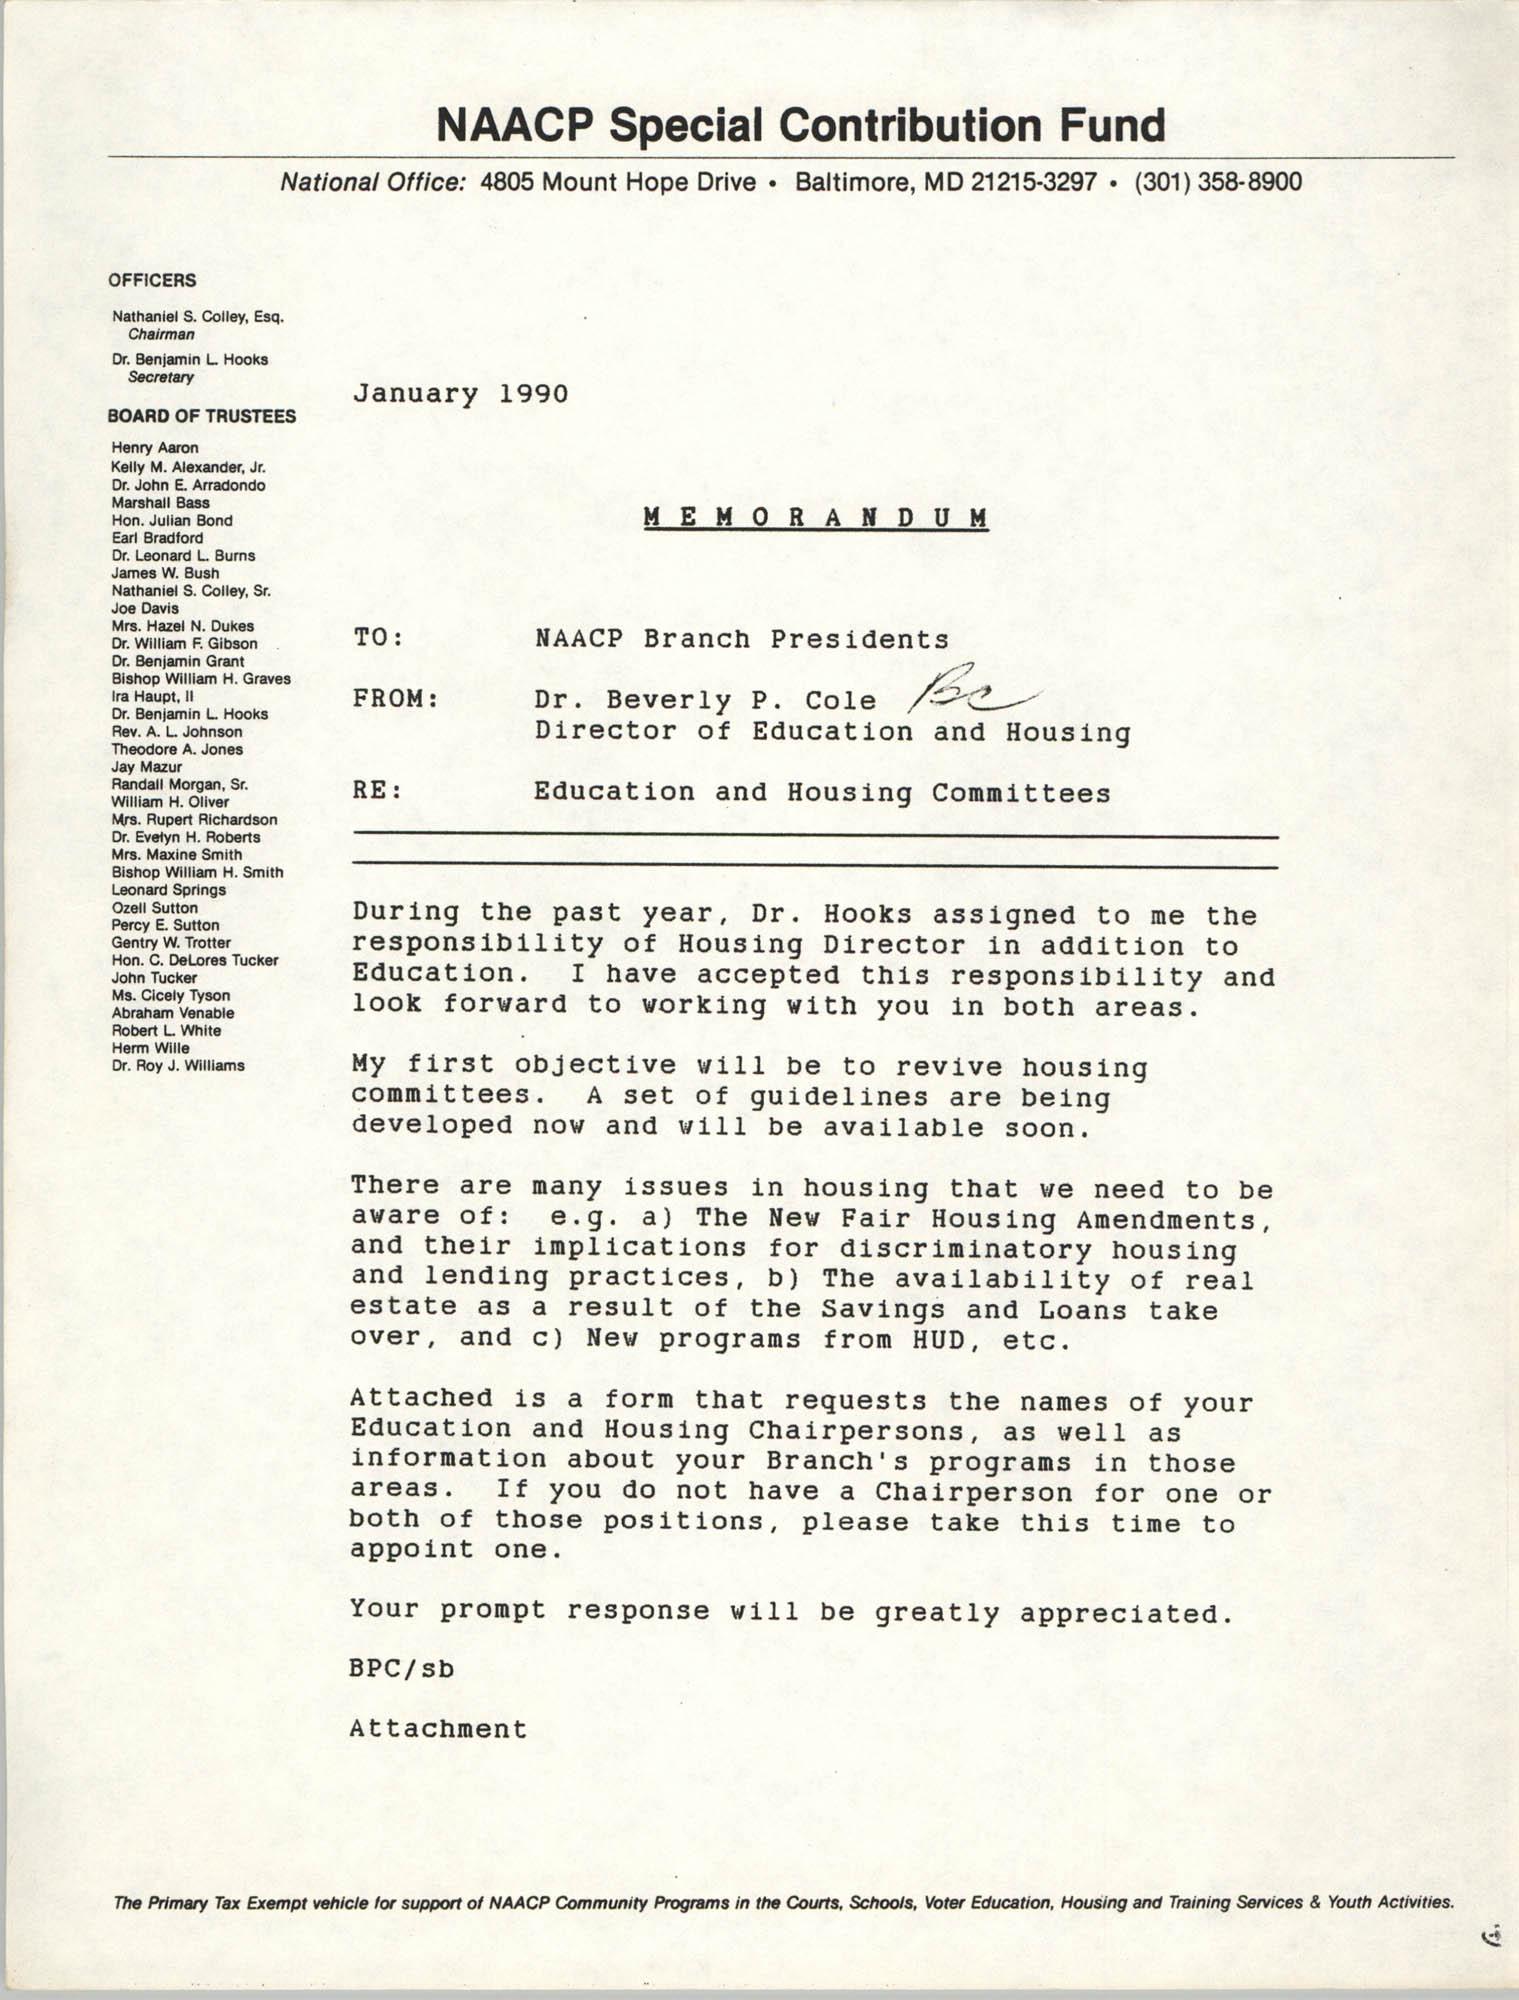 NAACP Special Contribution Fund Memorandum, January 1990